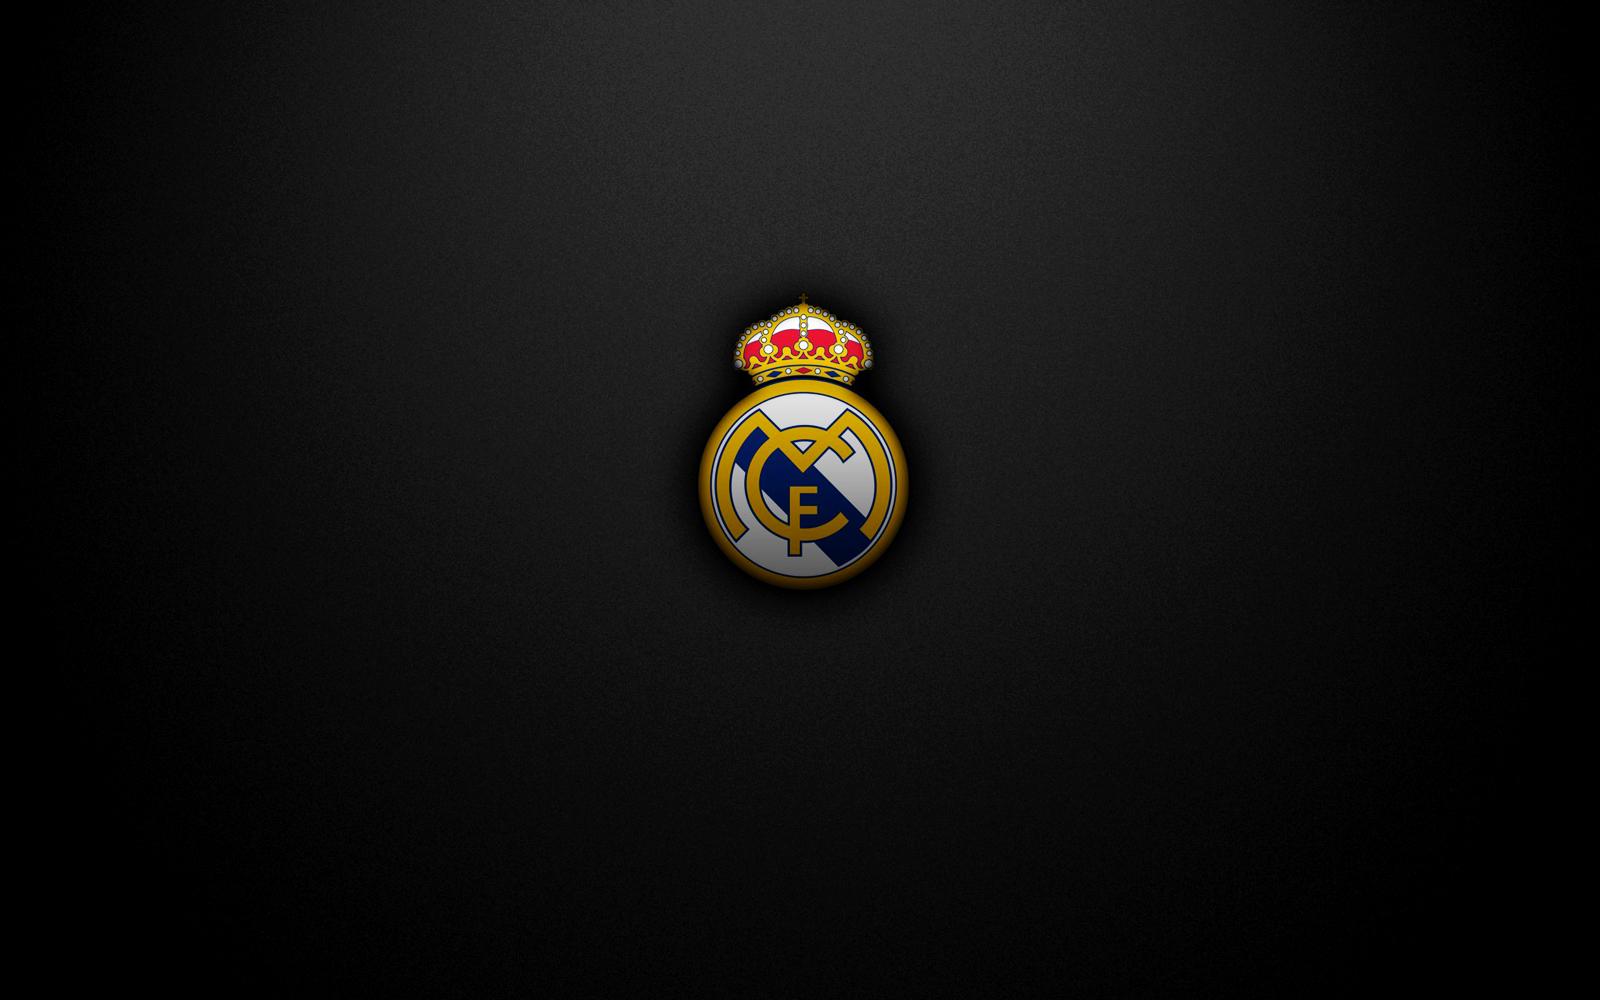 Real Madrid CF Logo HD Desktop Wallpapers Download Wallpapers in 1600x1000